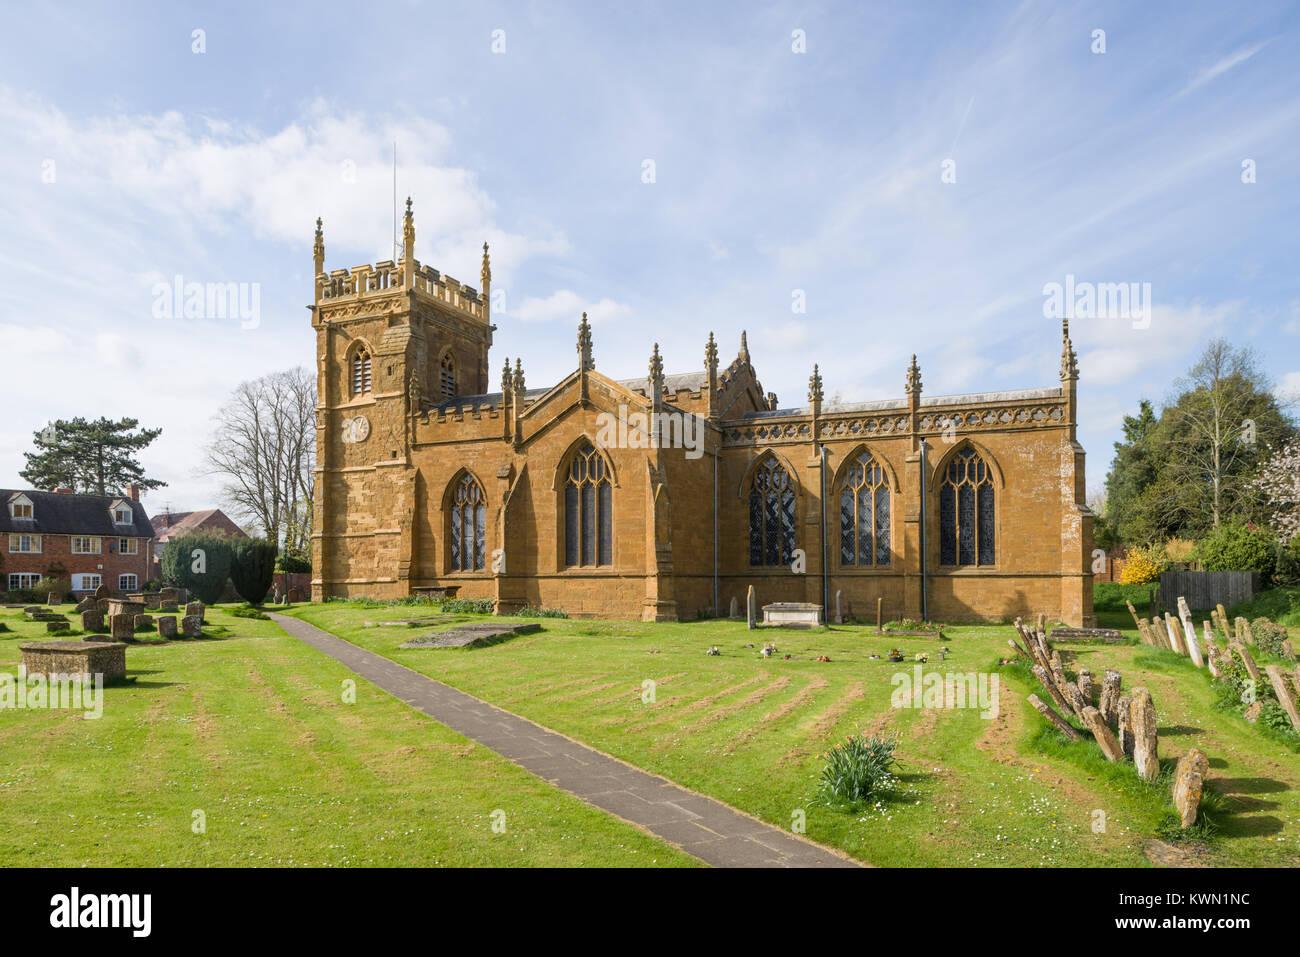 St. Peter's Church, Kineton, Warwickshire, England, UK - Stock Image